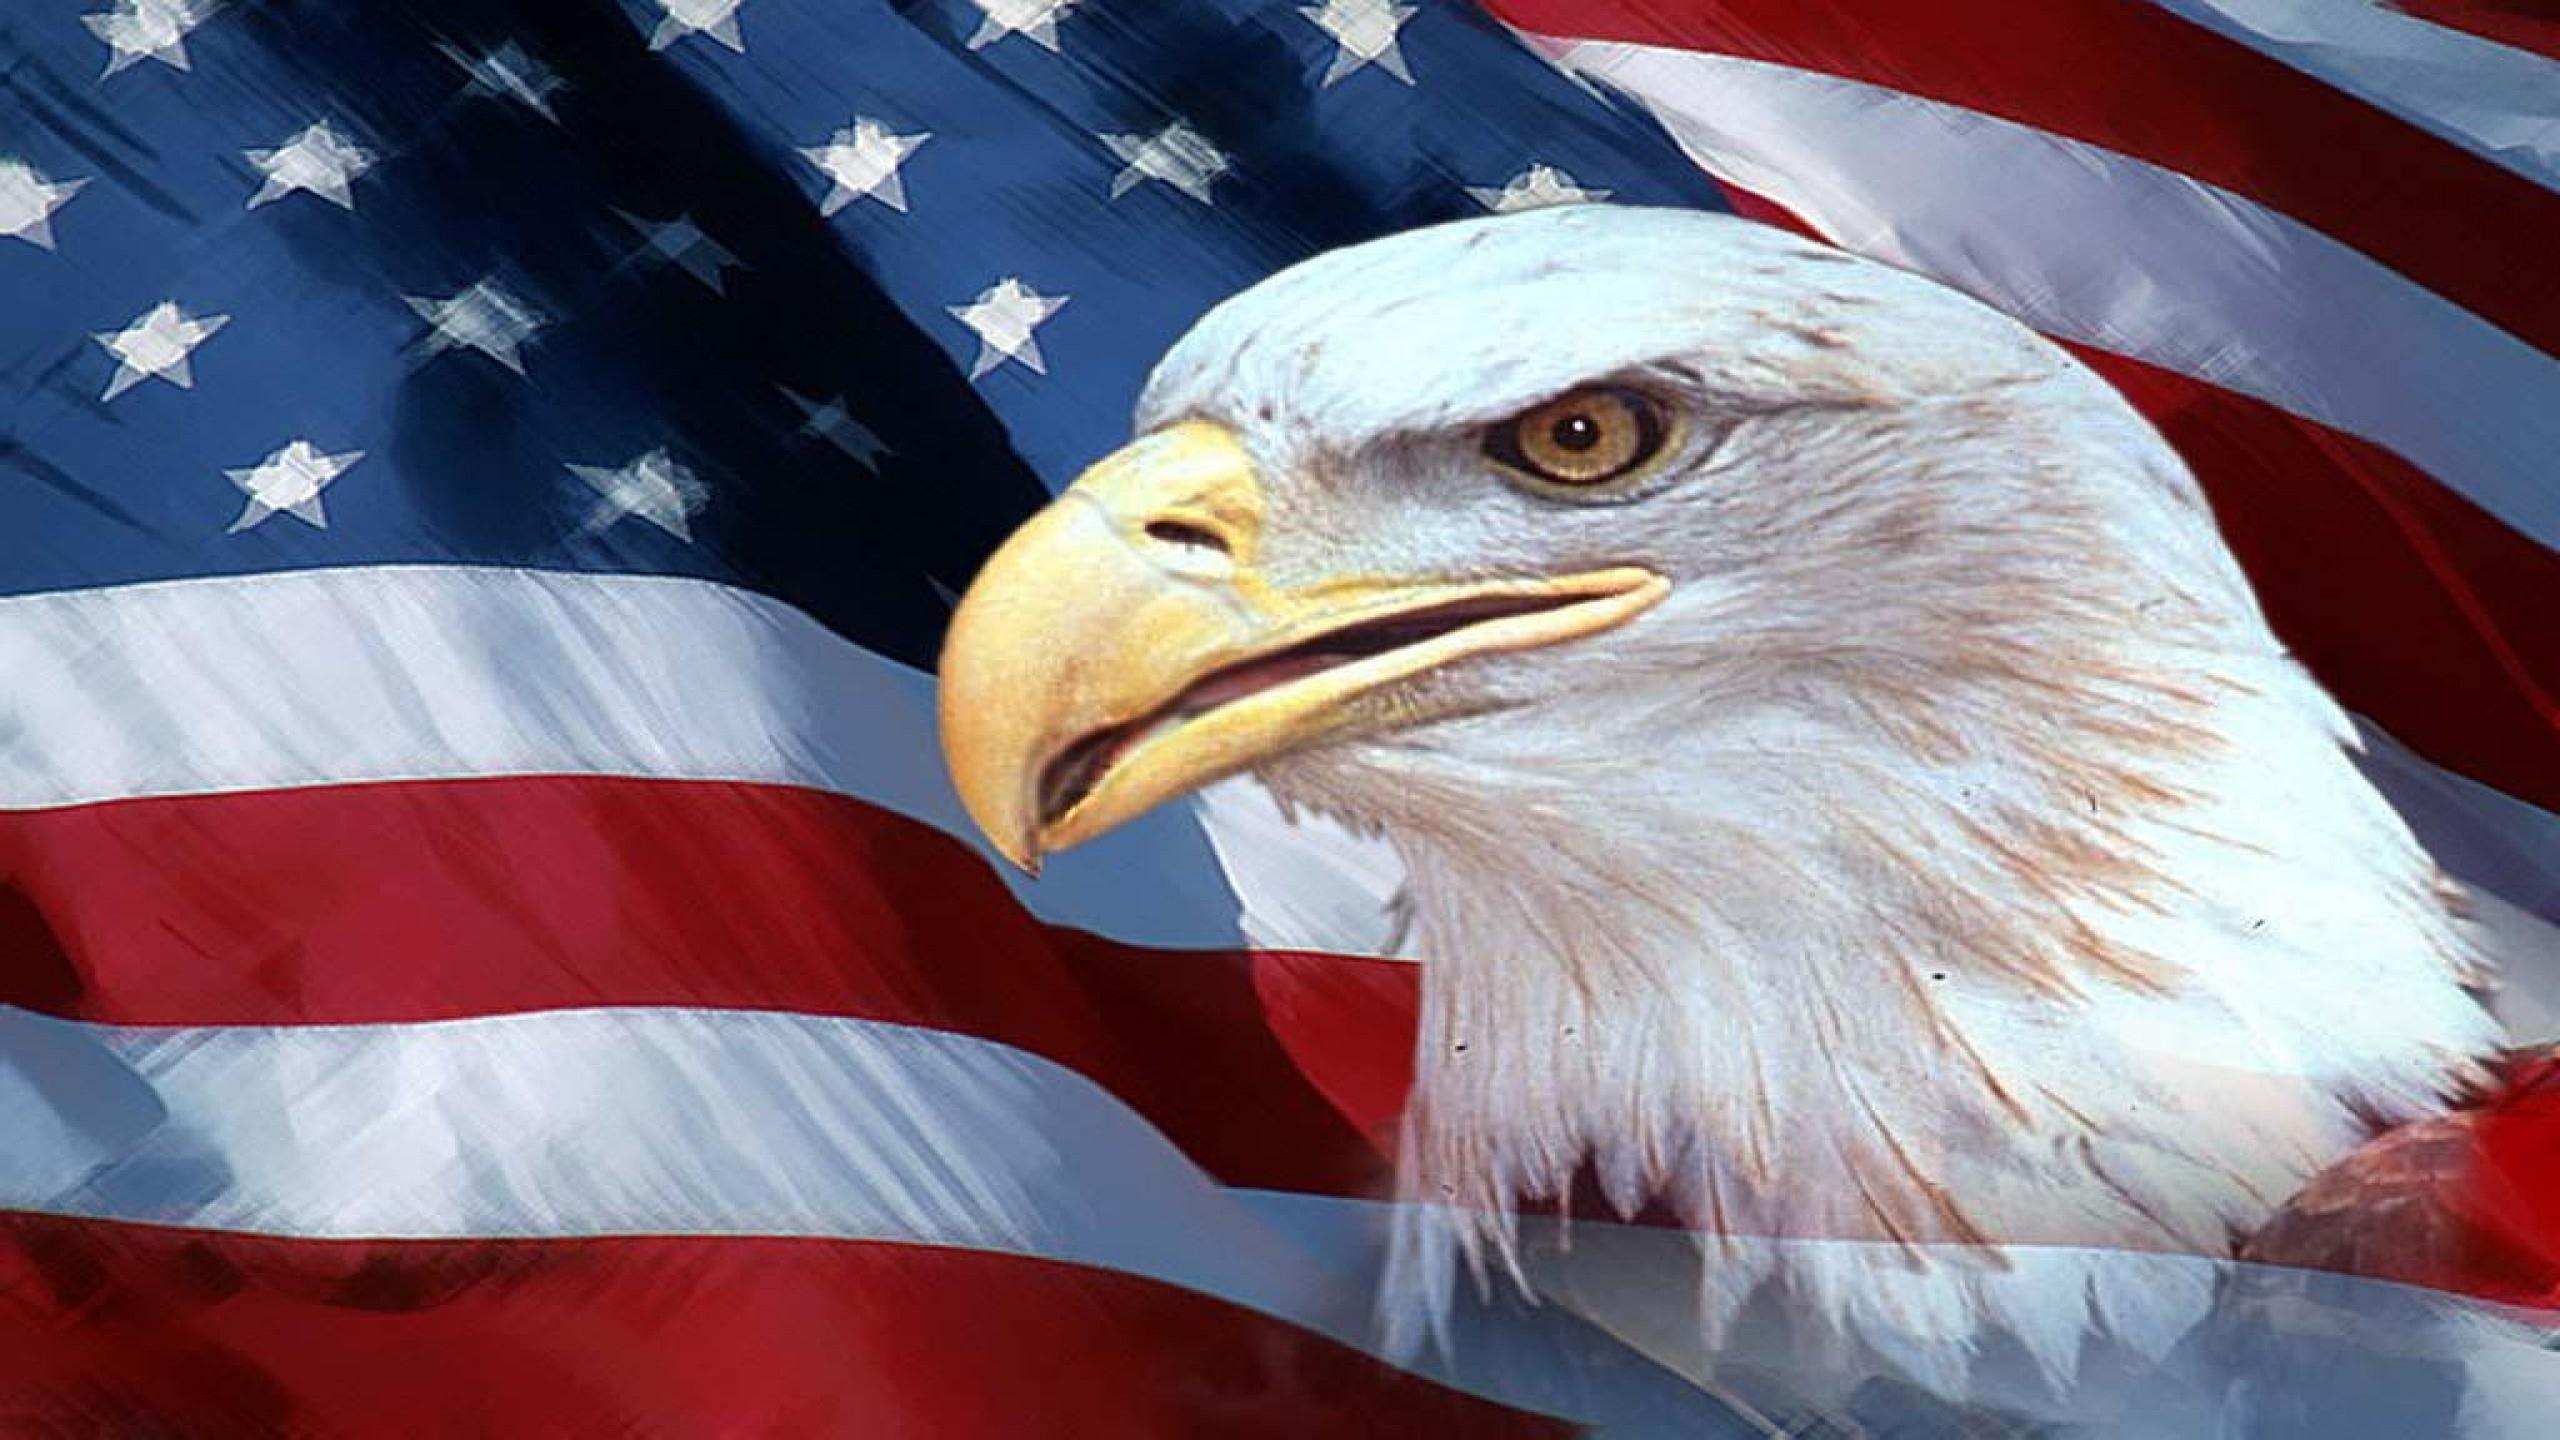 american flag and eagle hd desktop wallpaper, instagram photo